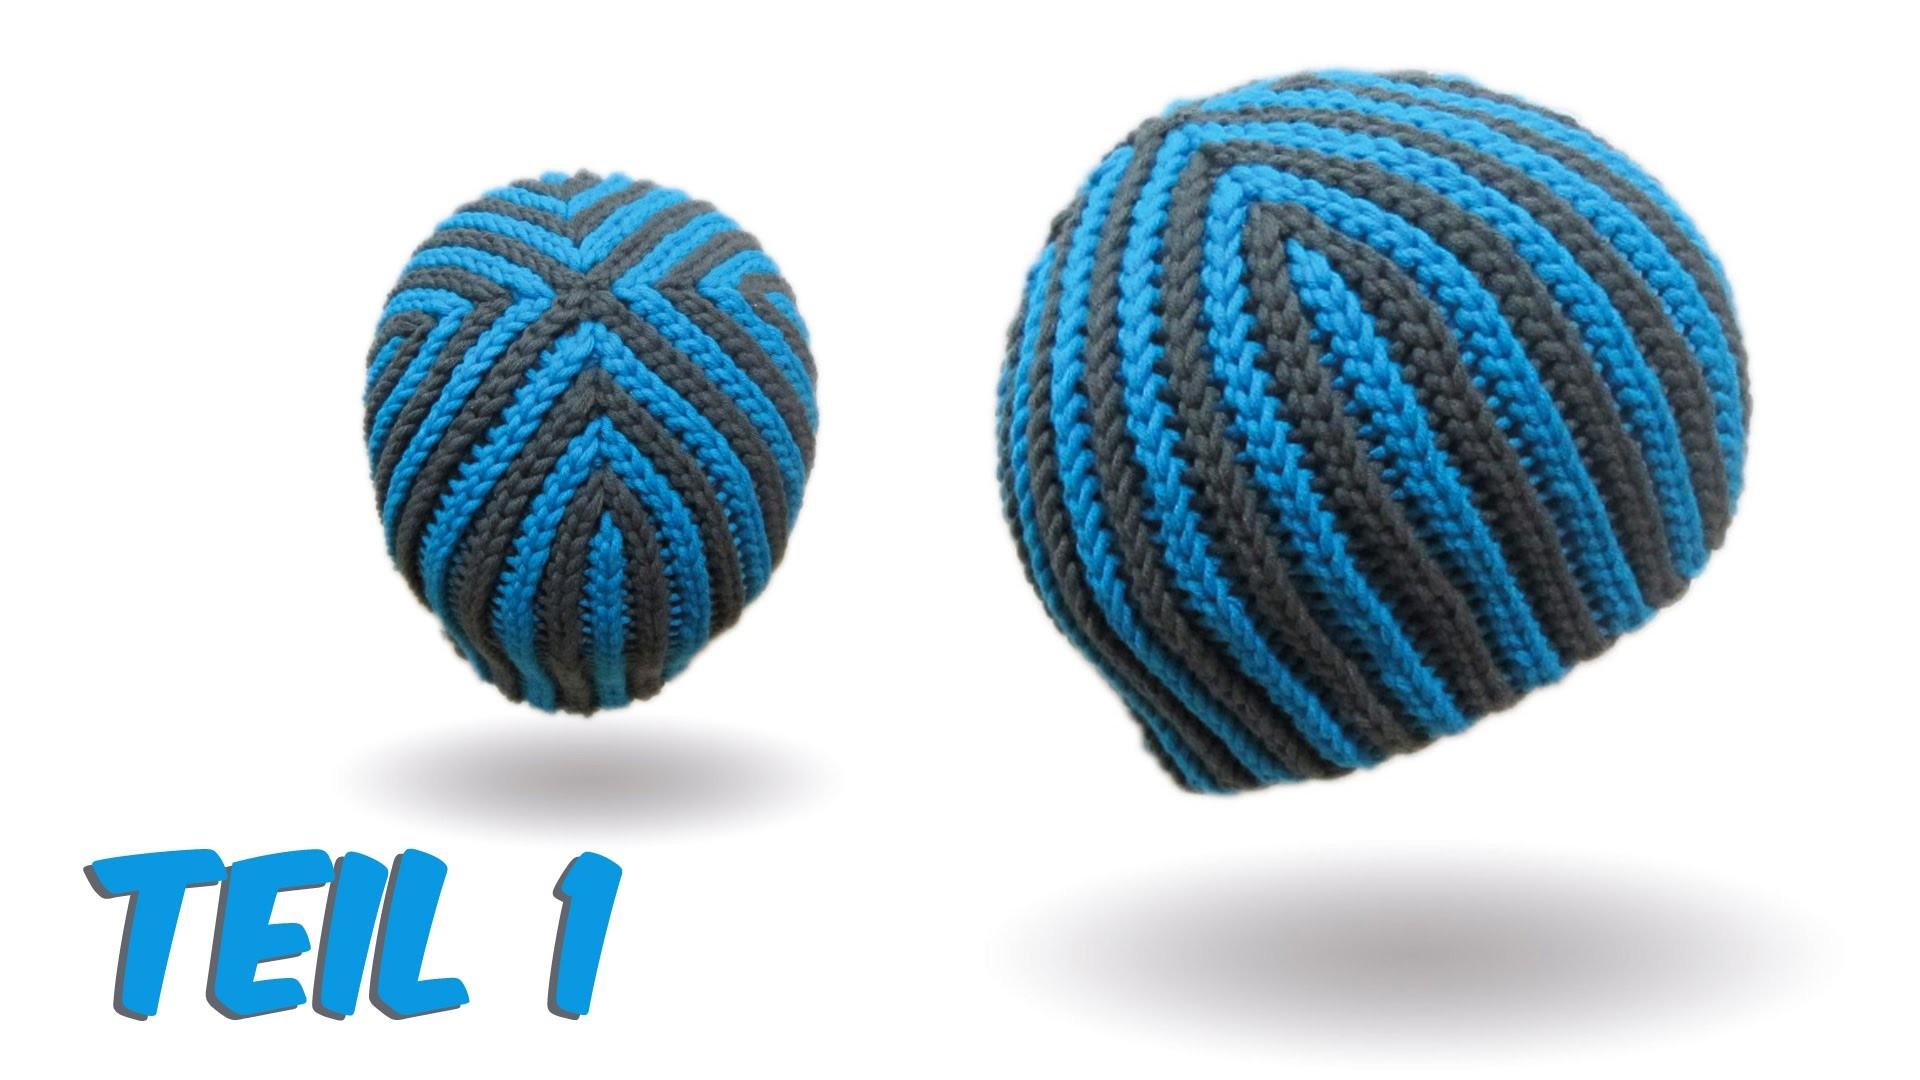 Mütze bosnisch häkeln - Hazelnut Beanie Teil 1 - Kettmaschen häkeln